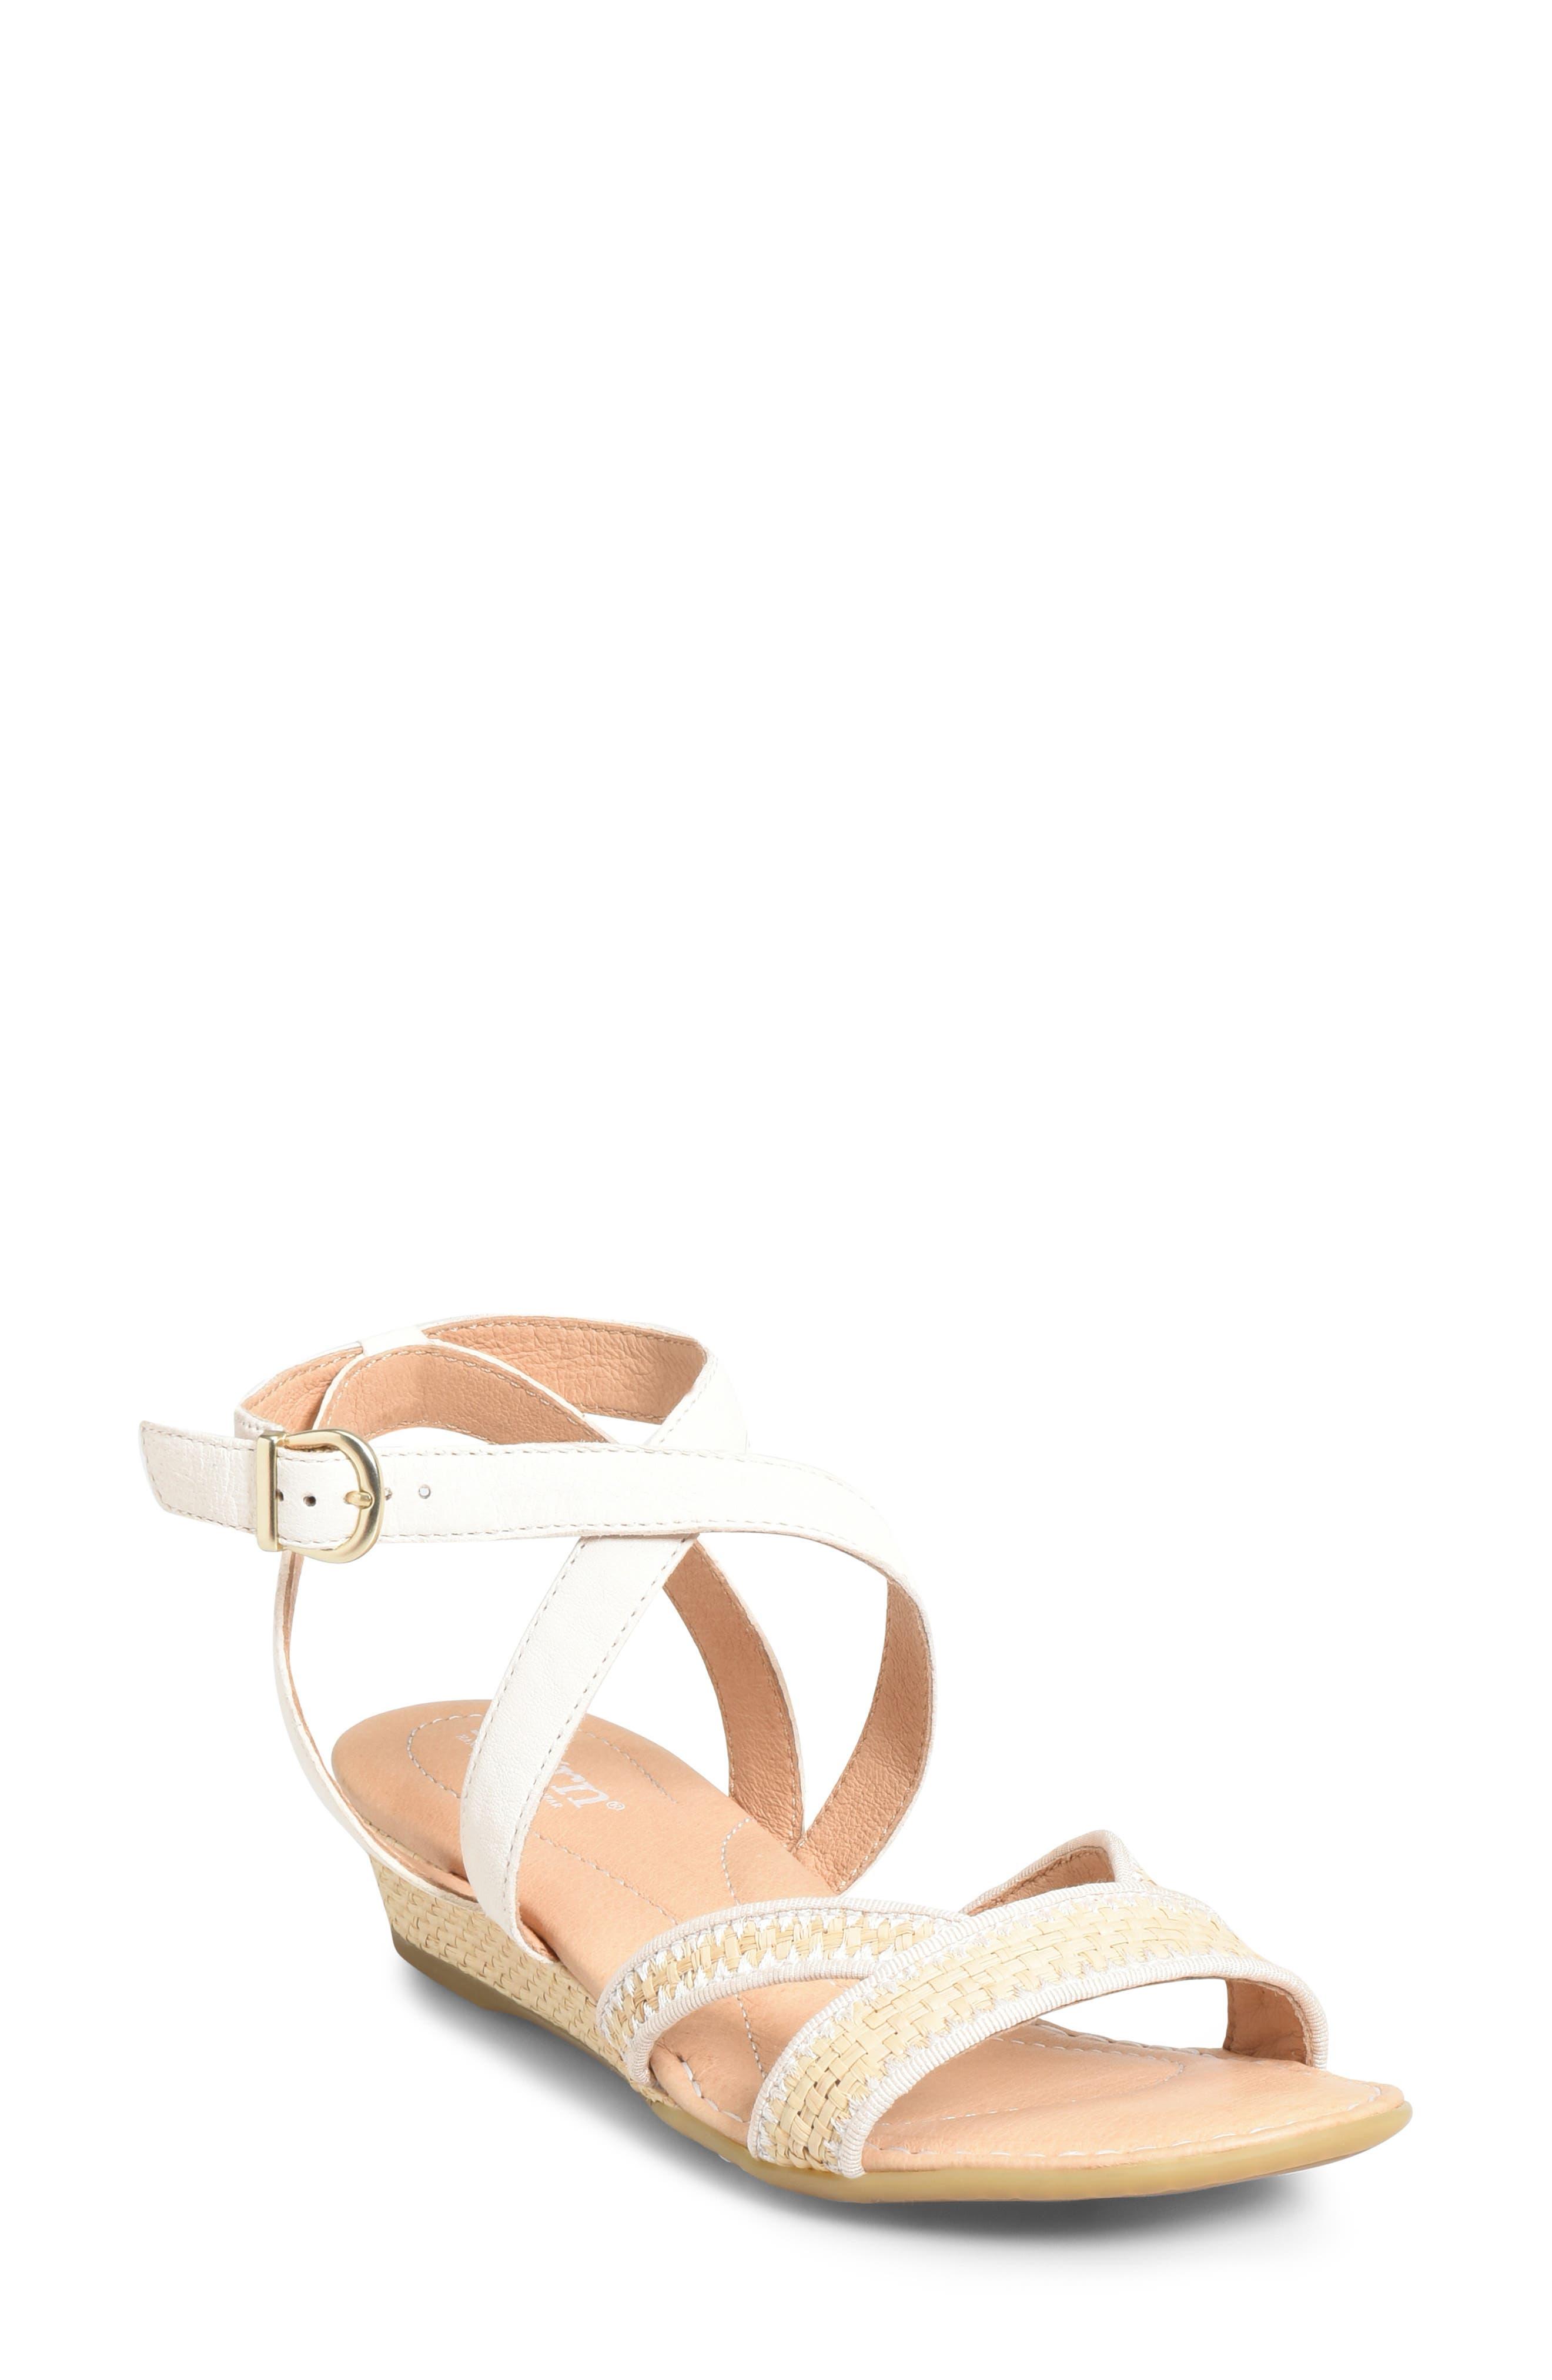 B?rn Cascade Sandal, White